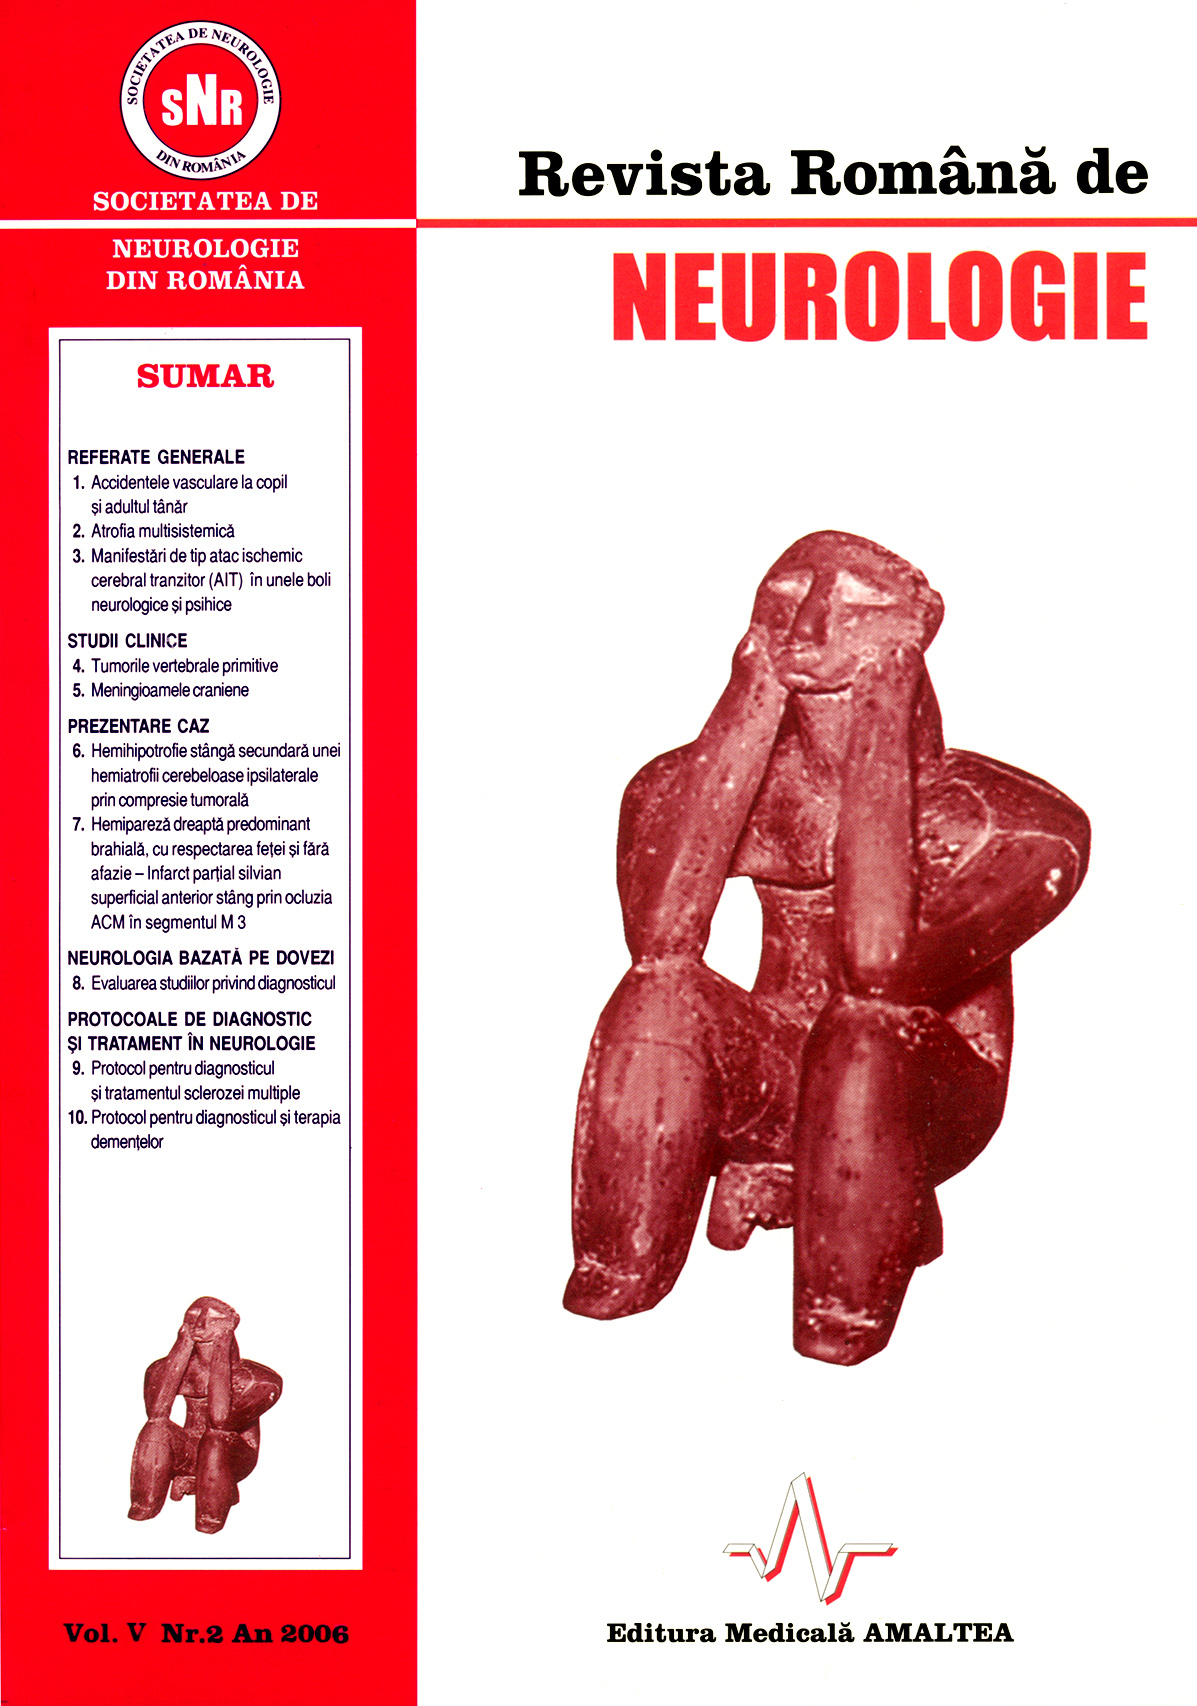 Romanian Journal of Neurology, Volume V, No. 2, 2006